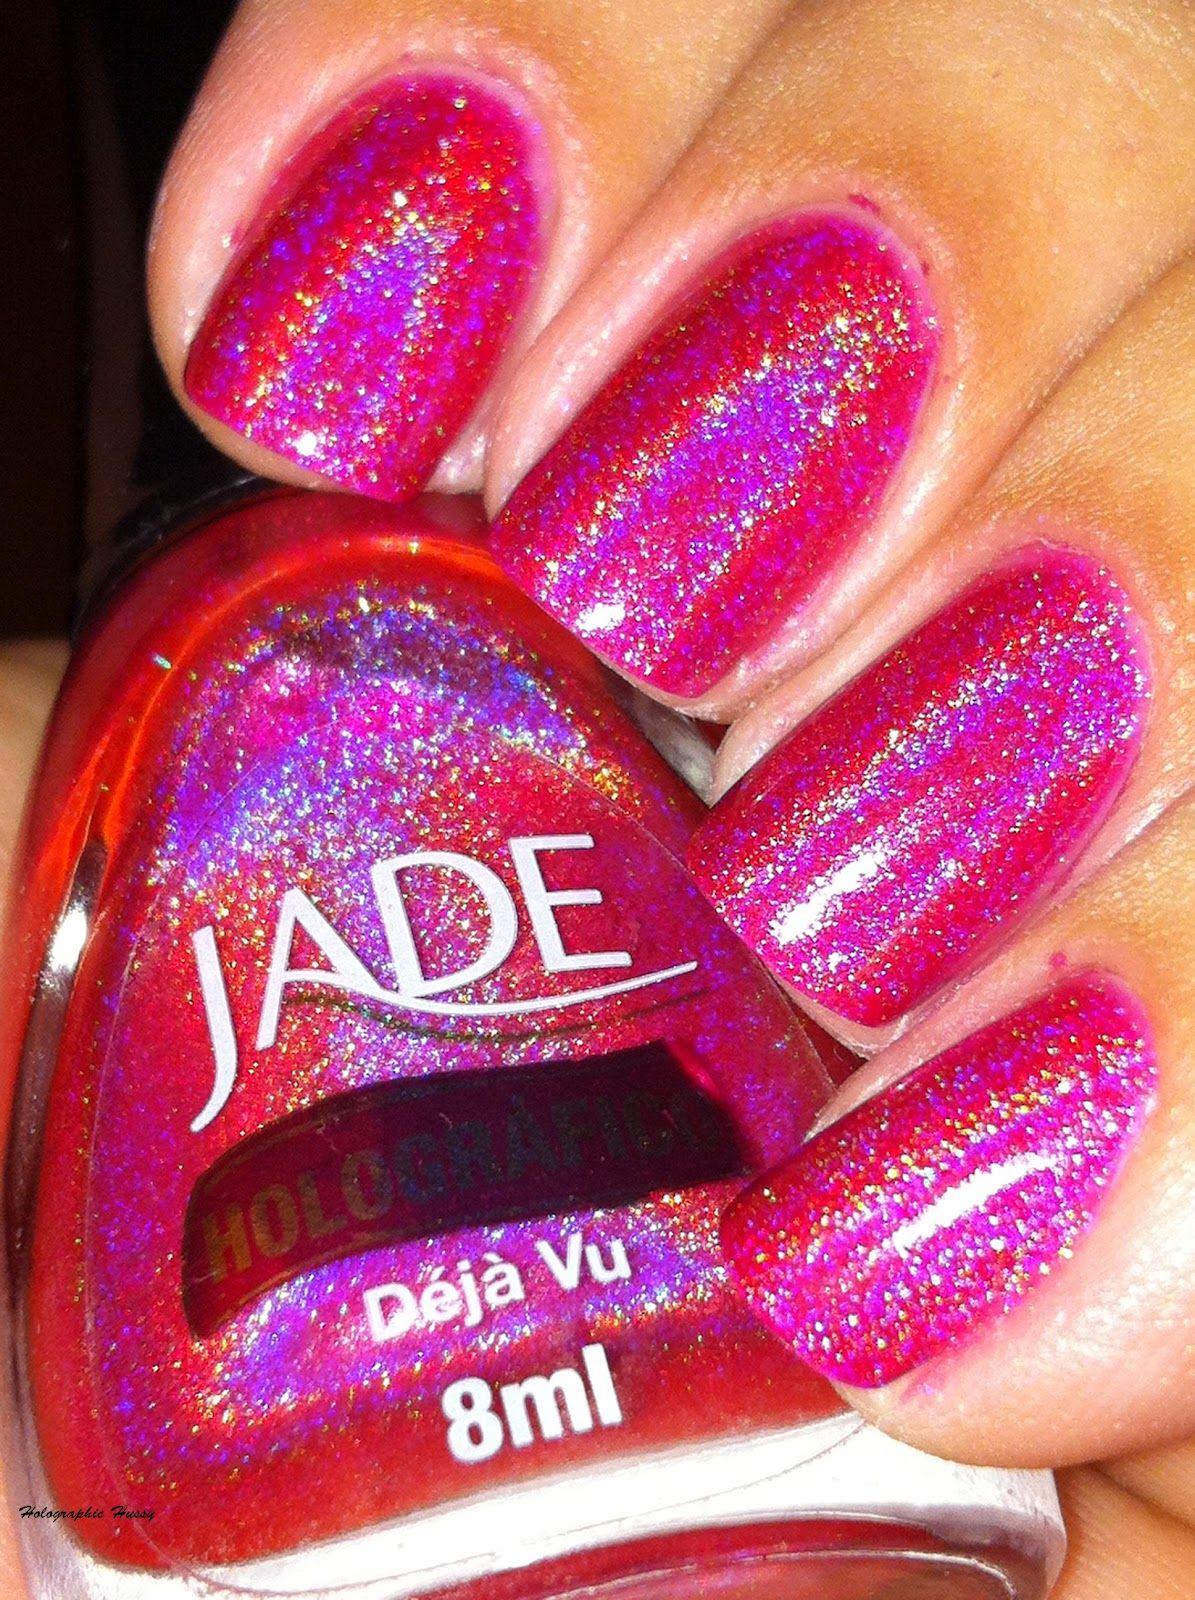 jade holographic nail polish - deja vu - Google Search | Nailed it ...